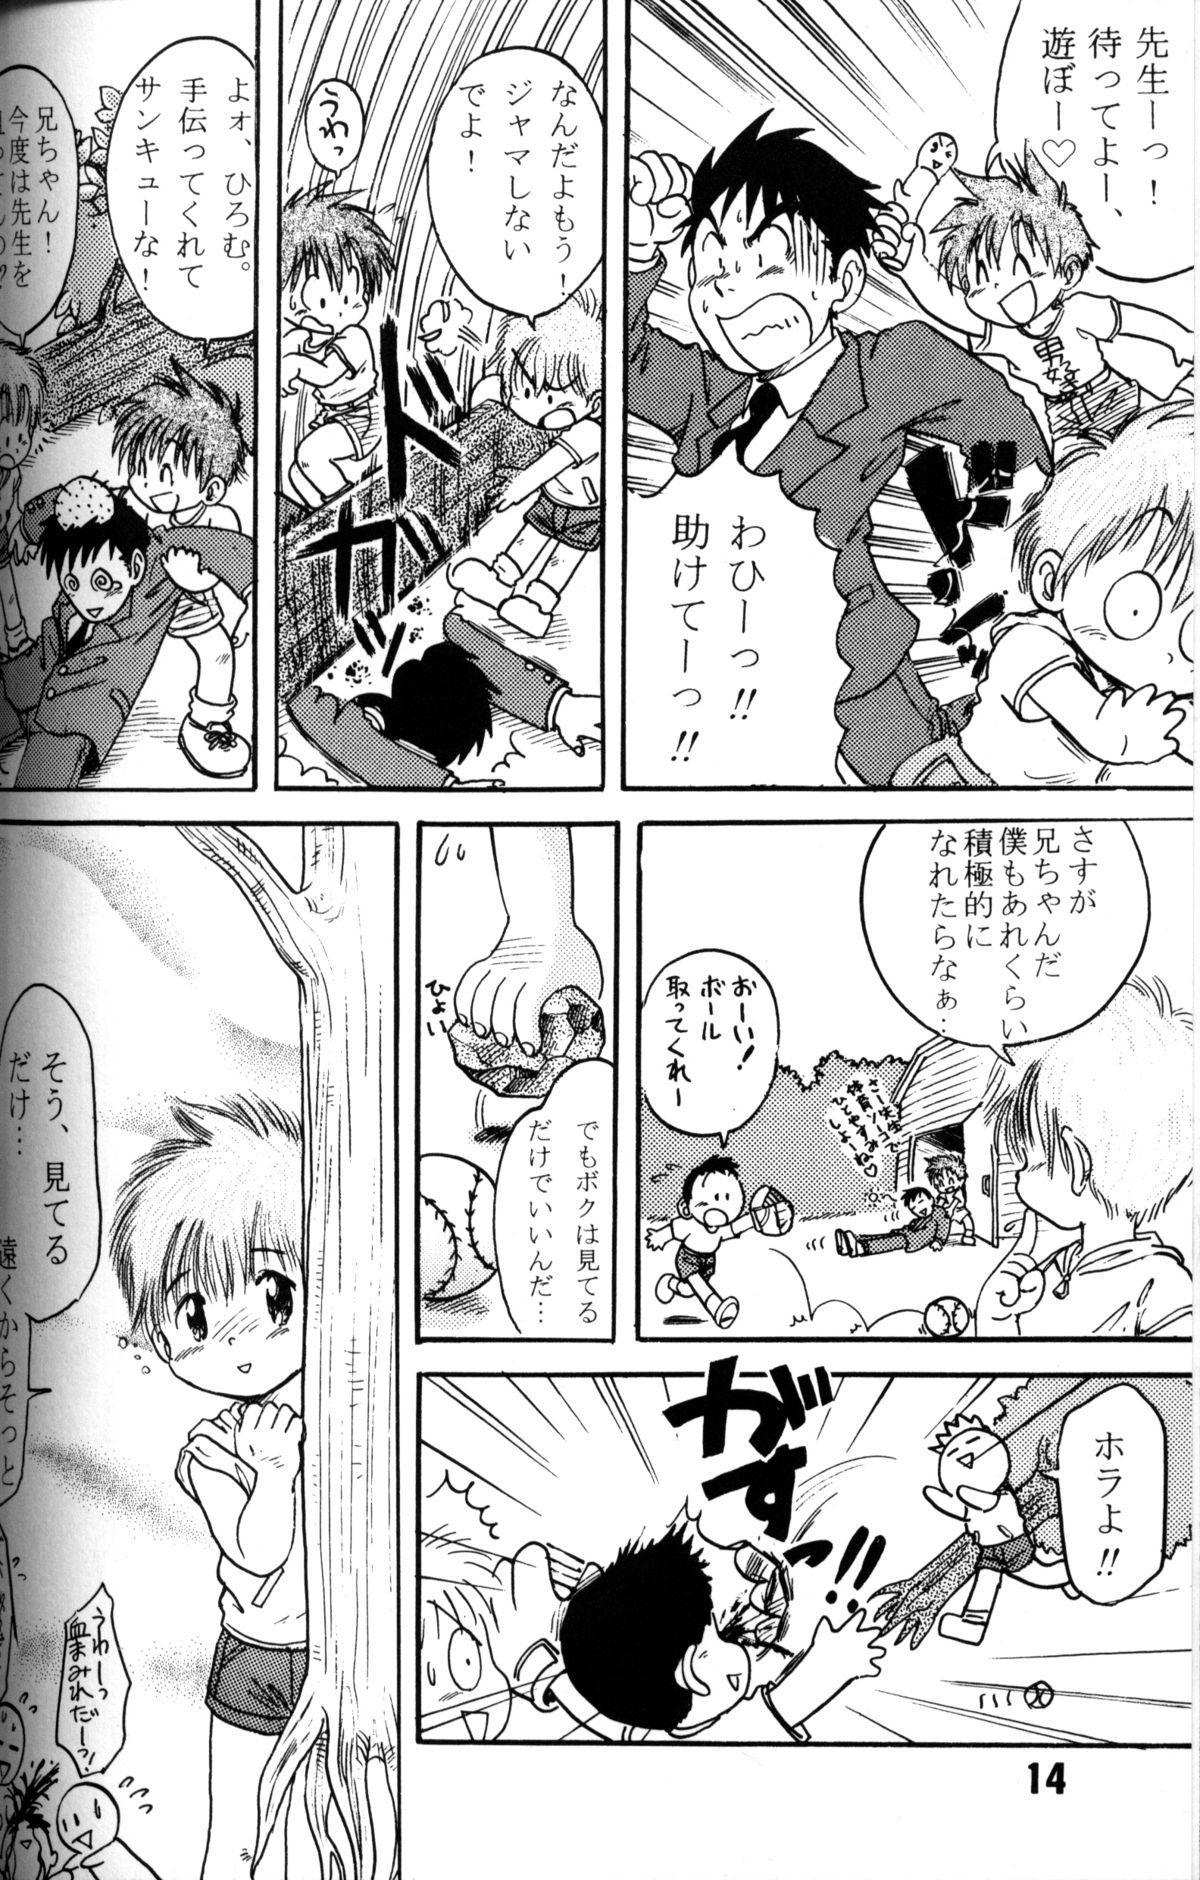 Anthology - Nekketsu Project - Volume 4 'Shounen Vanilla Essence' 12